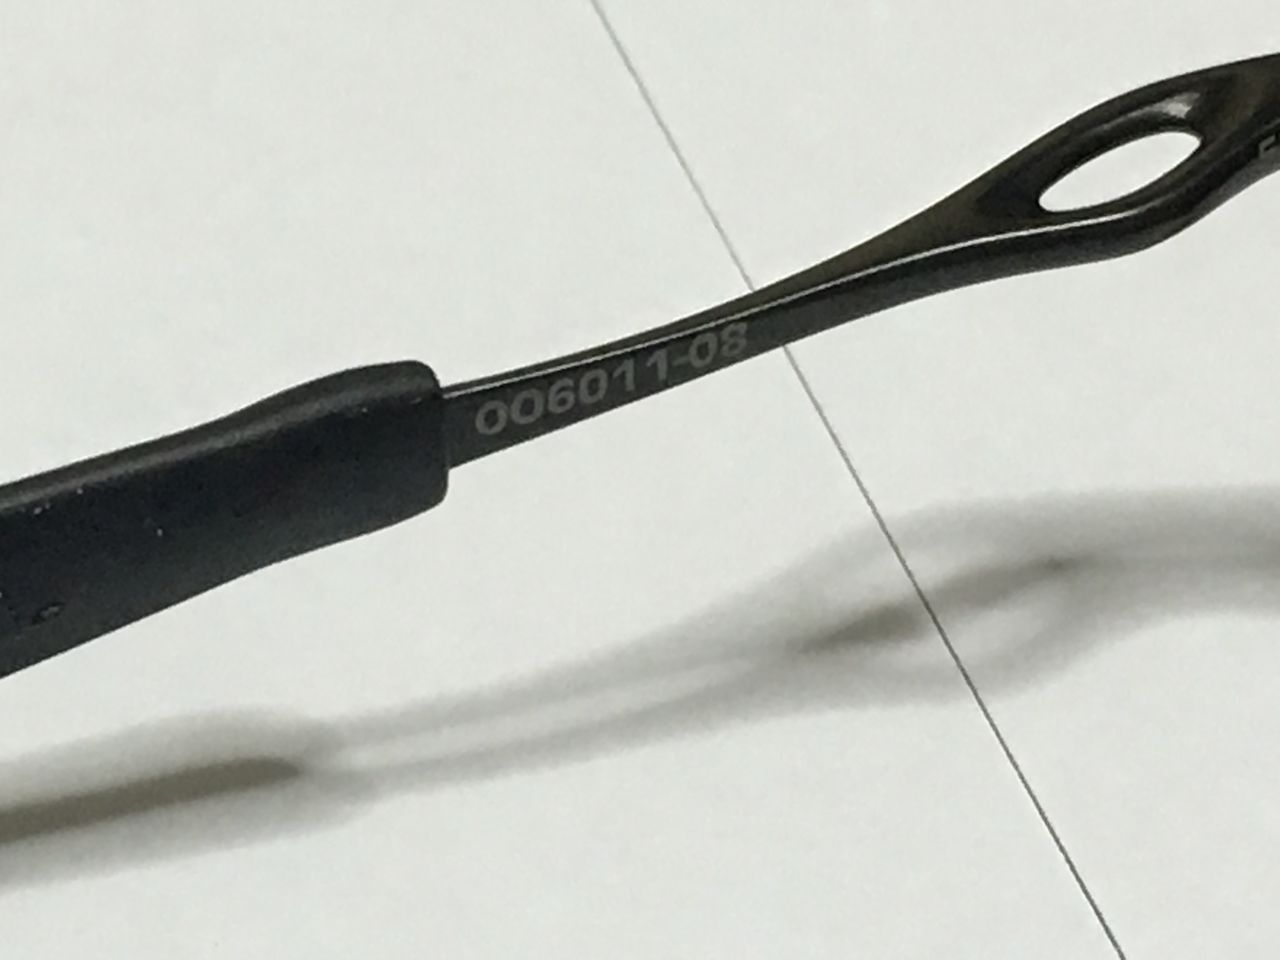 FS: Xsquared, Carbon frame OOBIP sku oo6011-08, Badman Plasma frame with Sapphire lenses - IMG_1380.jpg